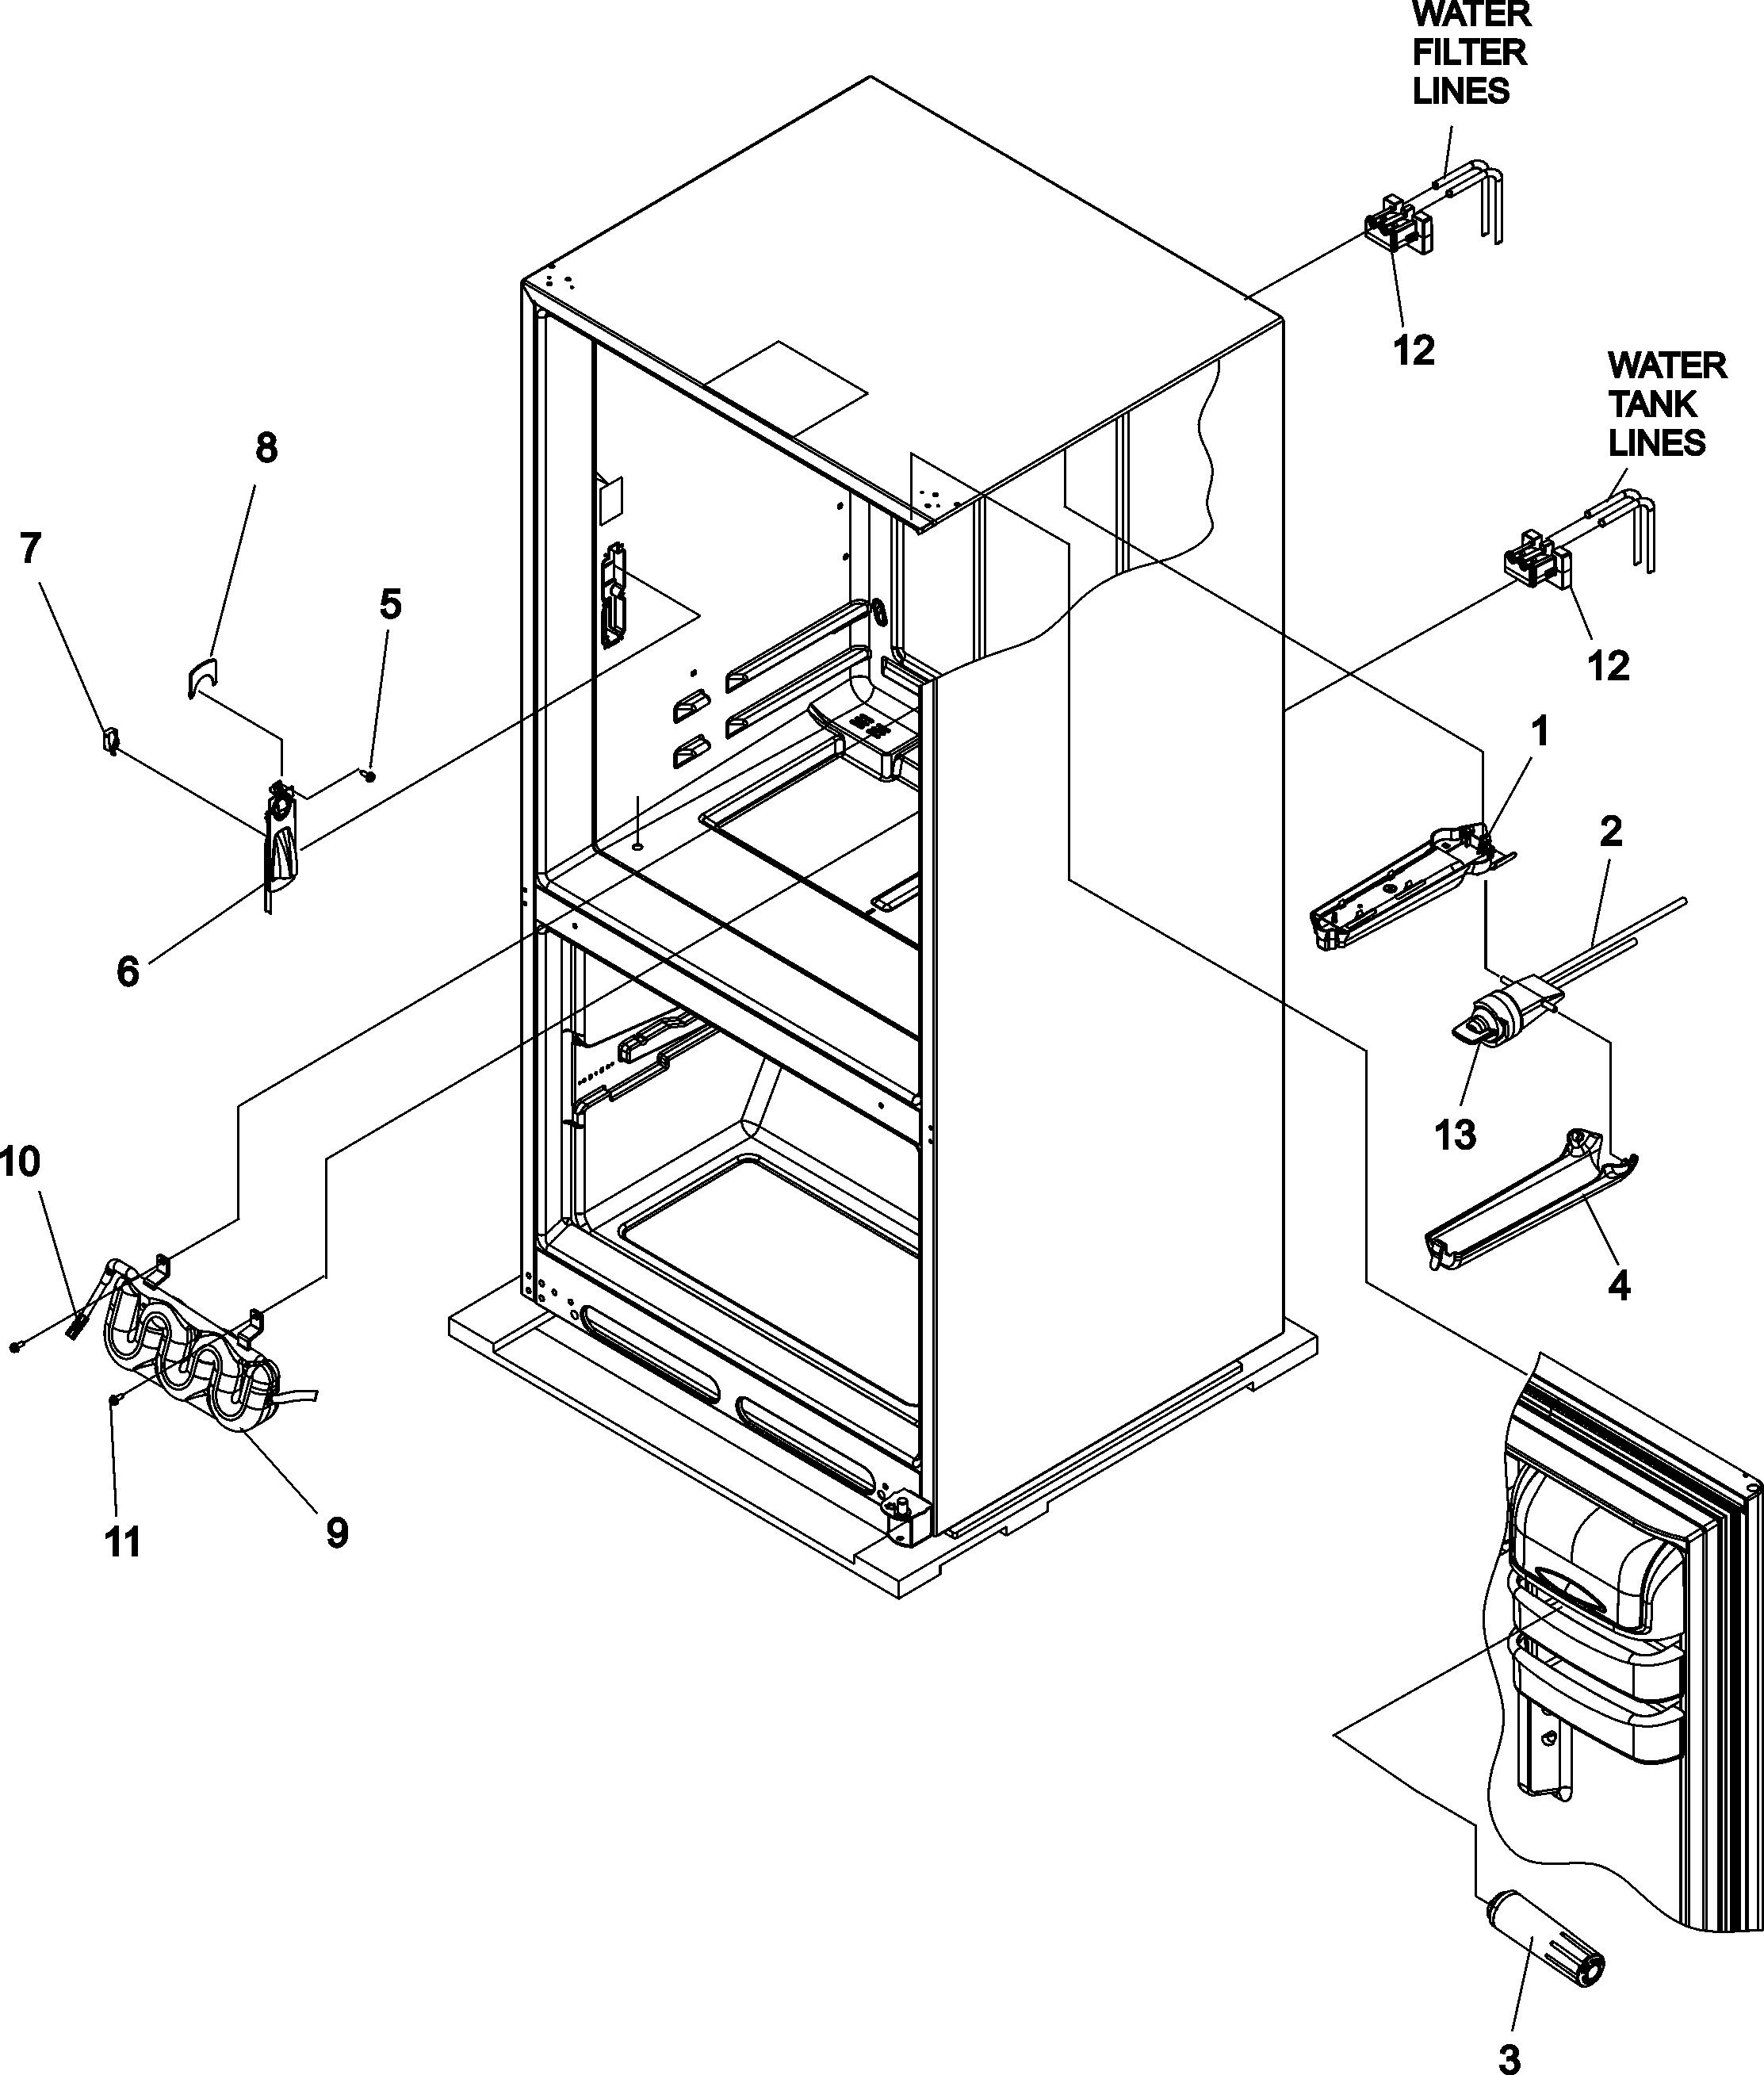 WATER DISPENSER & FILTER Diagram & Parts List for Model